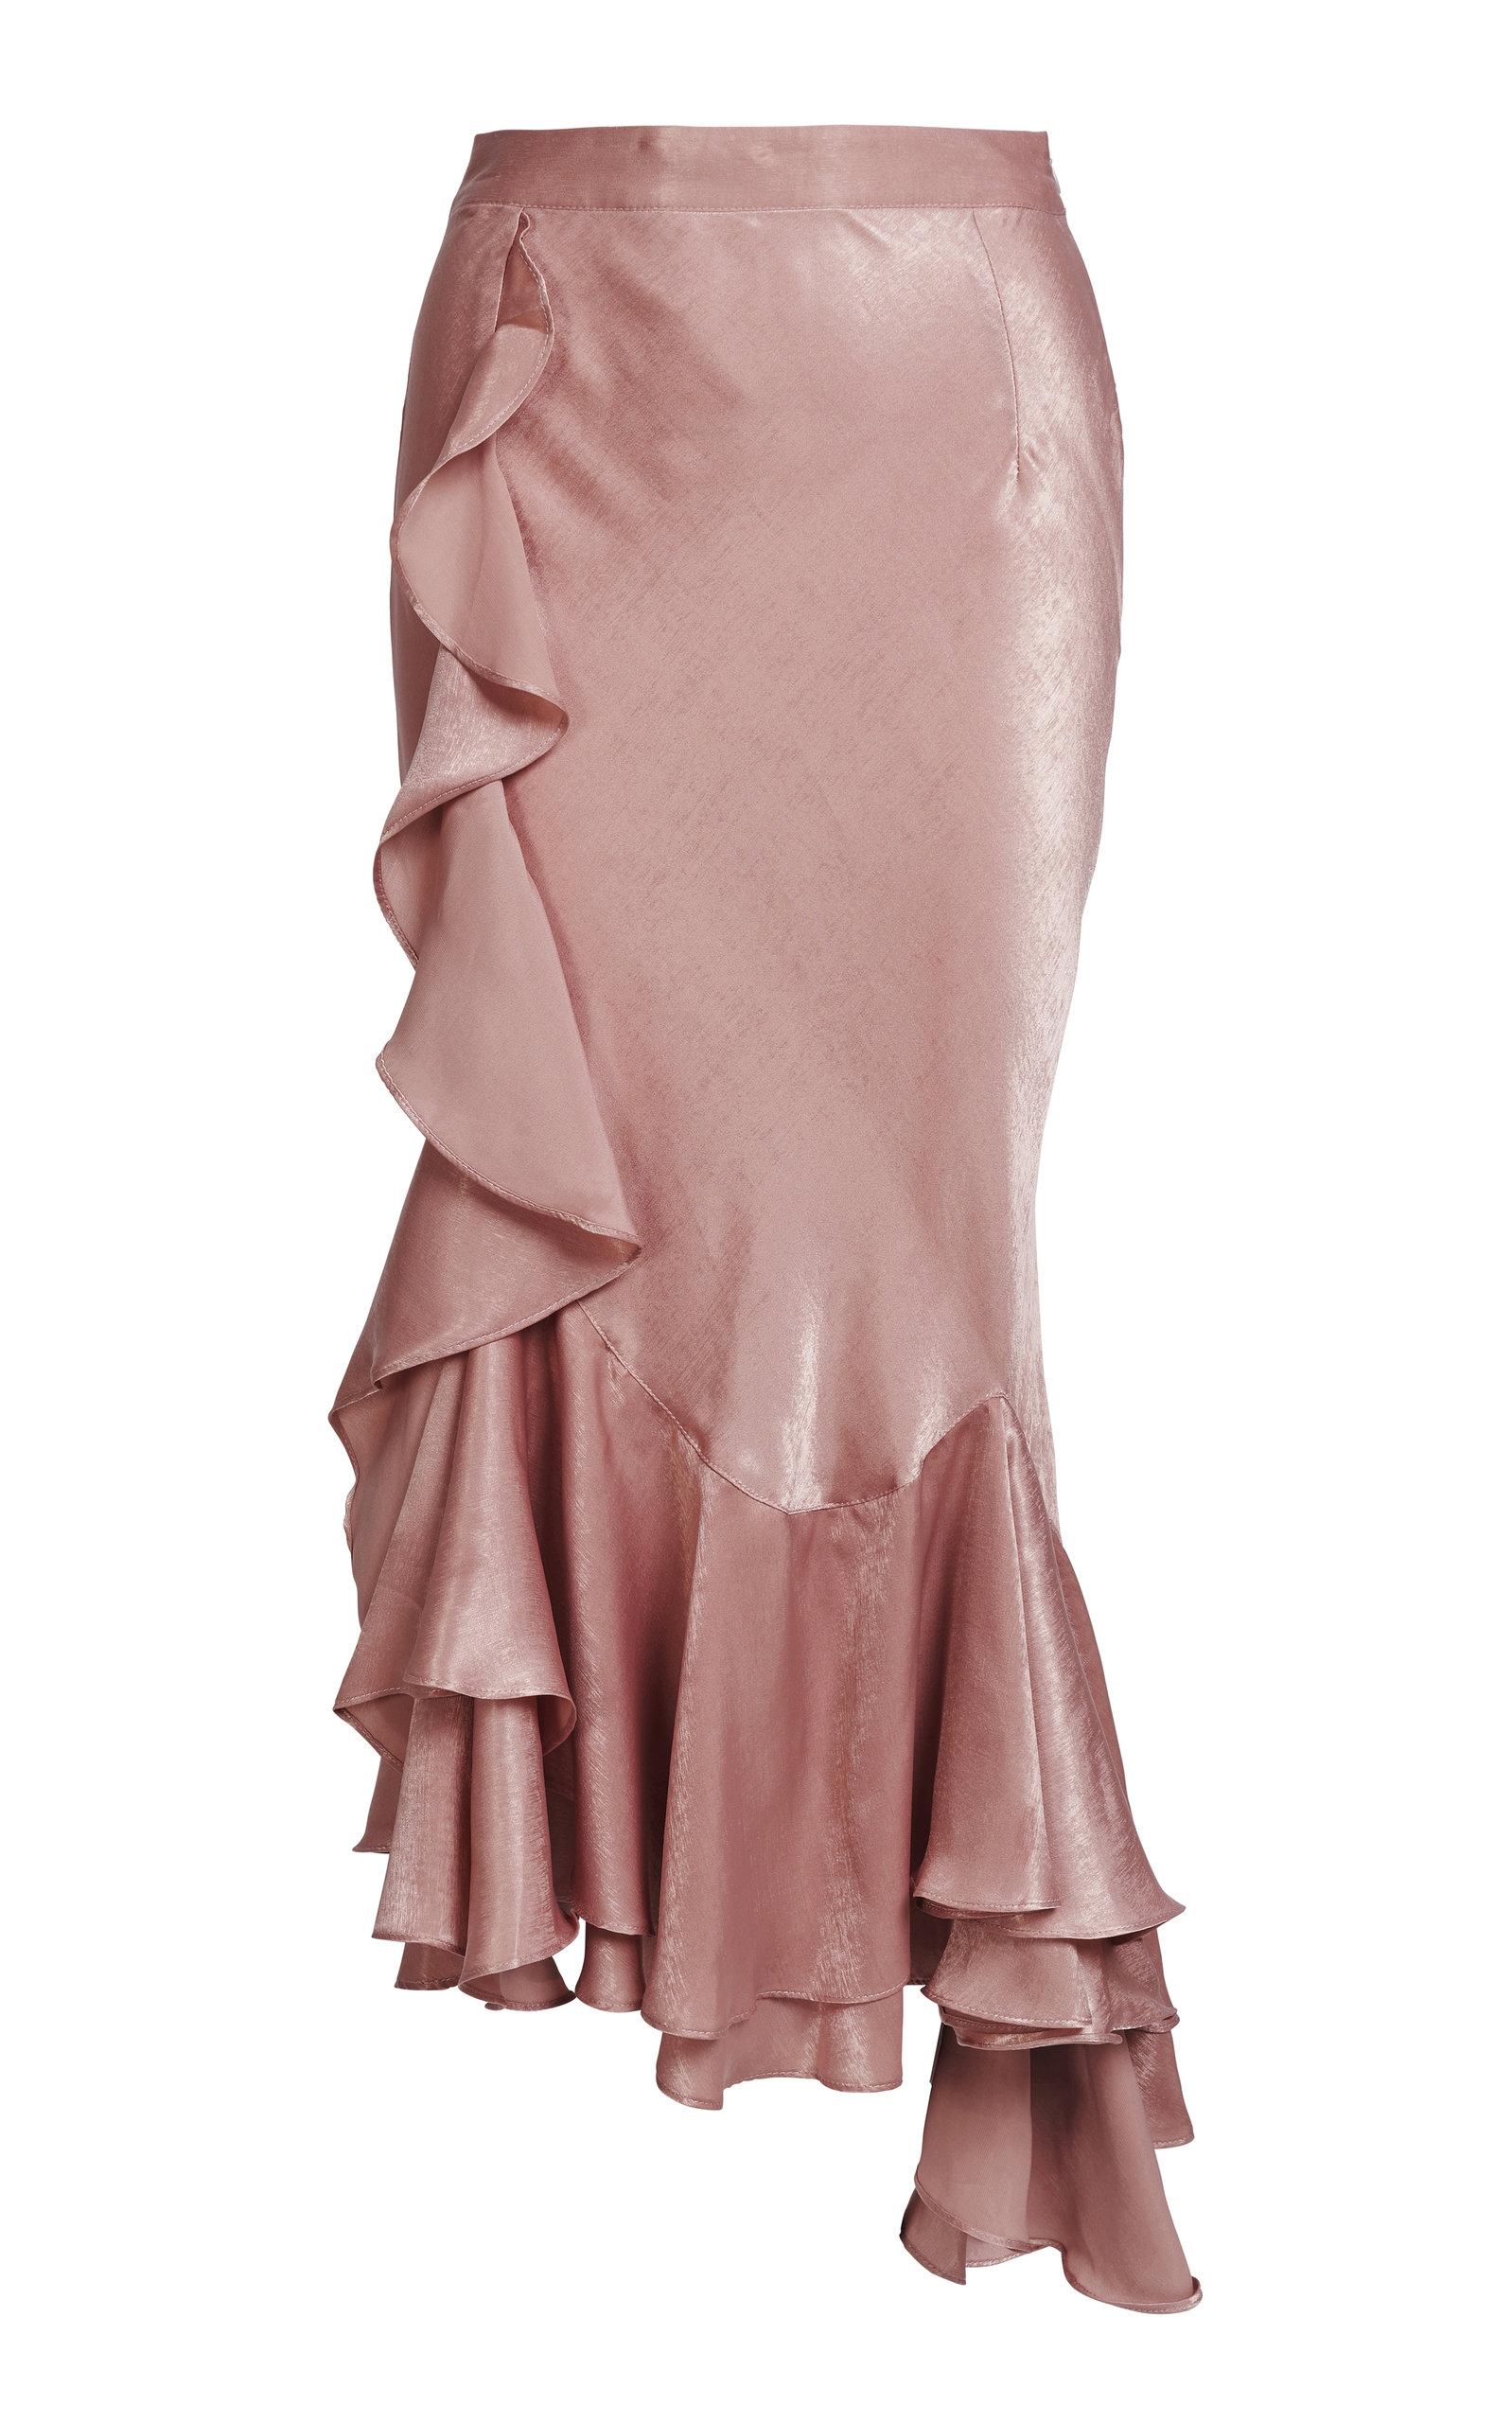 Frenchie Ruffled Taffeta Maxi Skirt in Pink